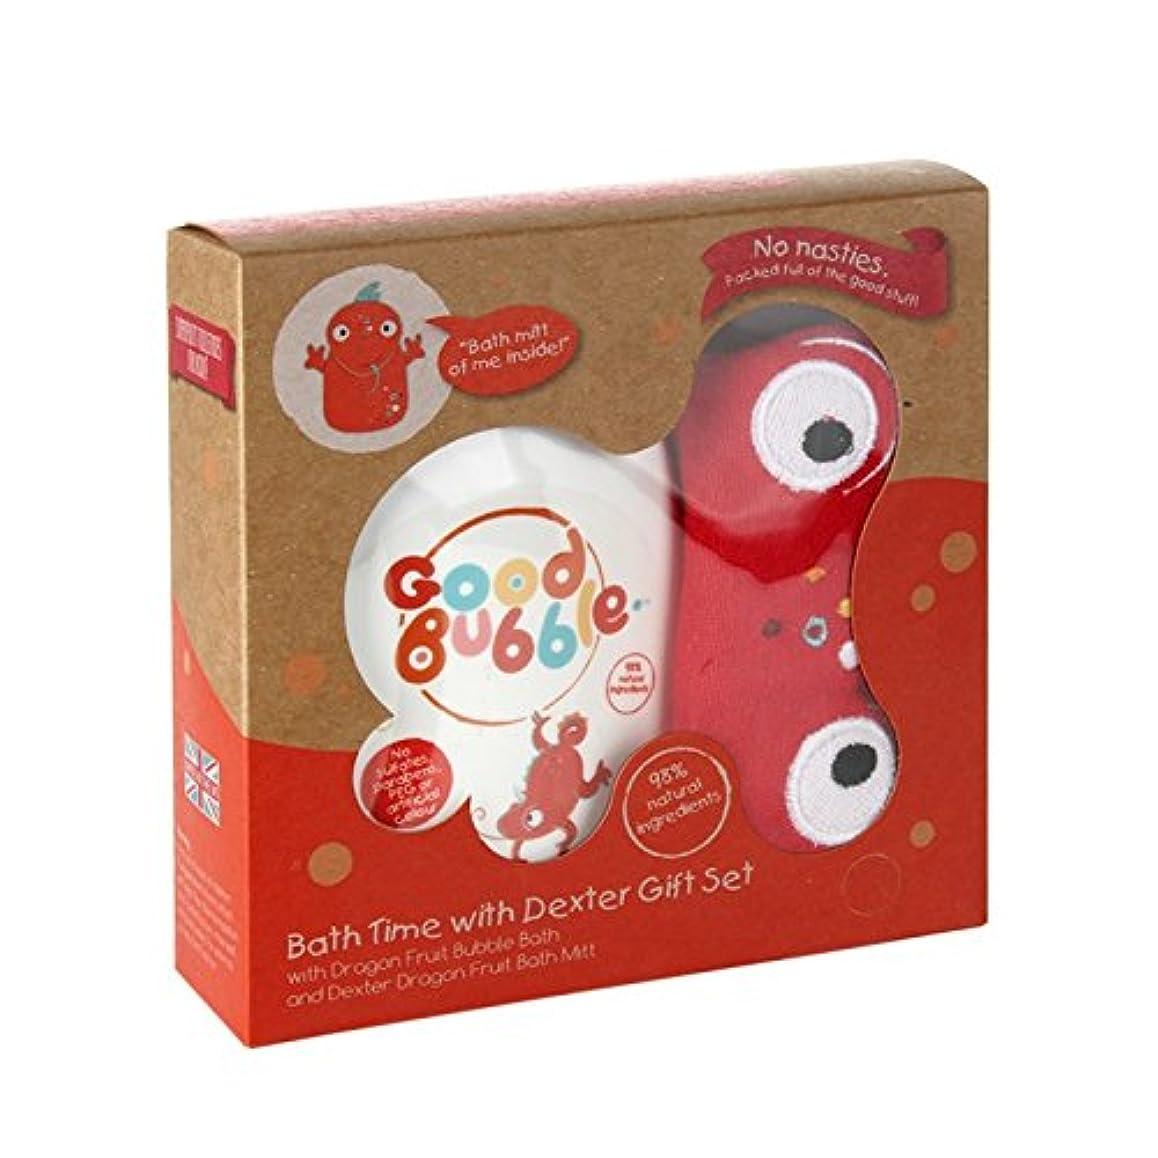 Good Bubble Dexter Dragonfruit Gift Set 550g (Pack of 2) - 良いバブルデクスターDragonfruitギフトセット550グラム (x2) [並行輸入品]